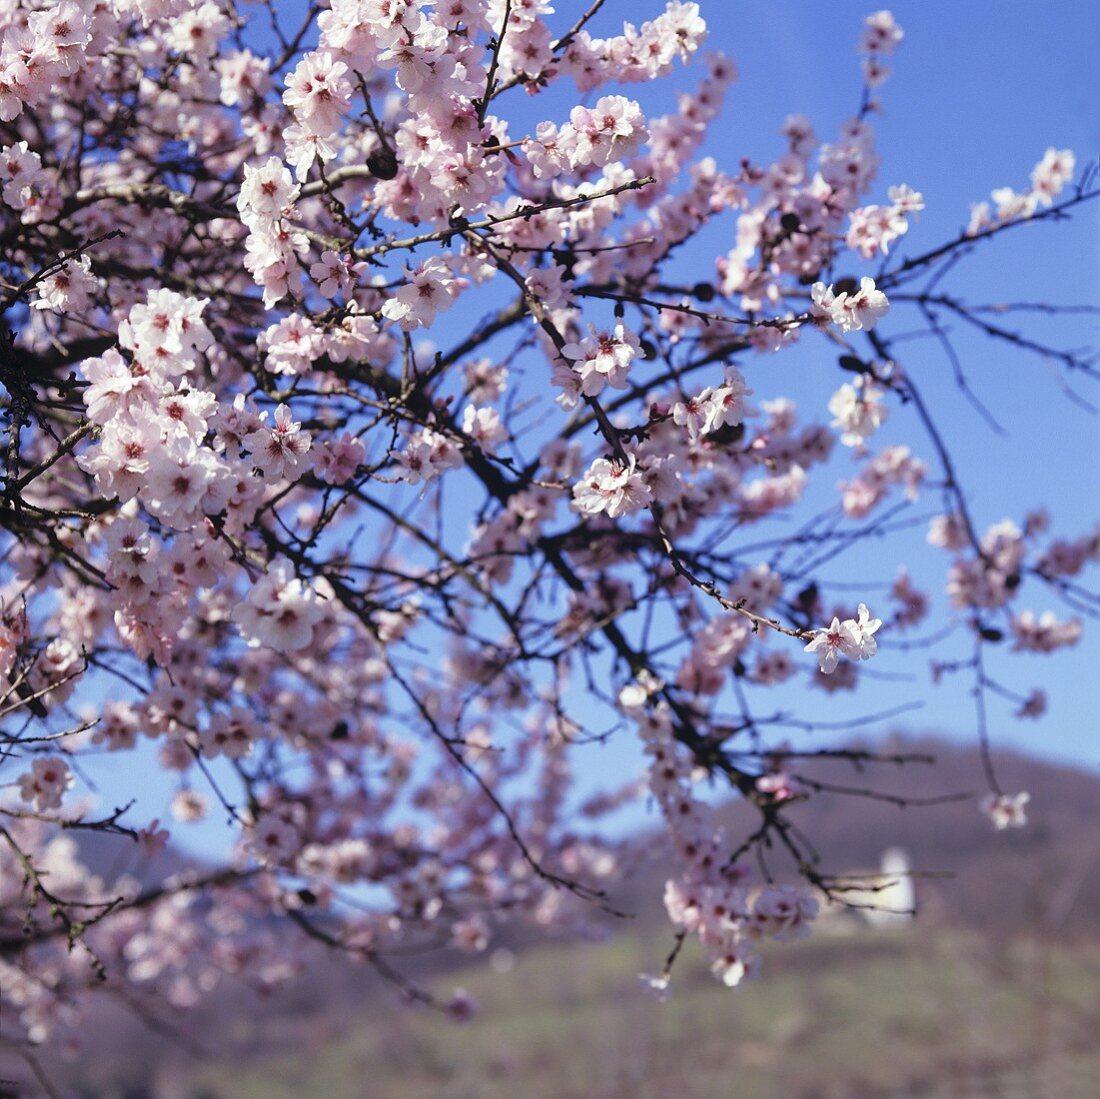 Flowering almond tree, vineyards in background (Palatinate)